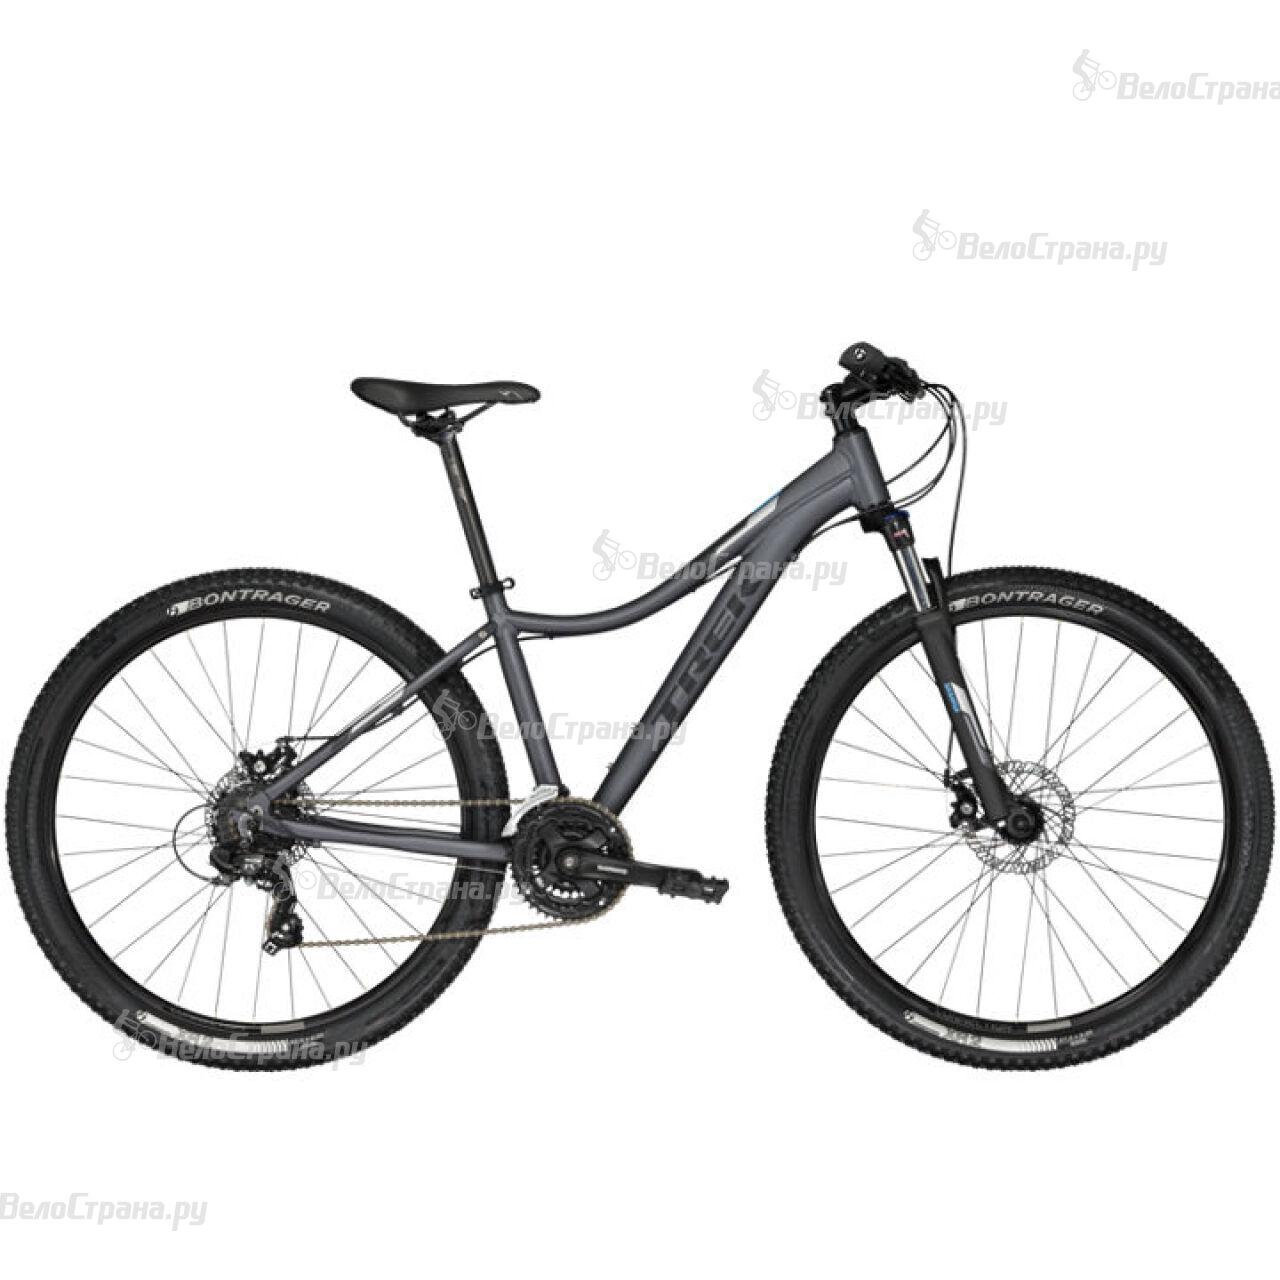 Велосипед Trek Skye S WSD 29 (2017) велосипед trek madone 3 1 wsd 2013